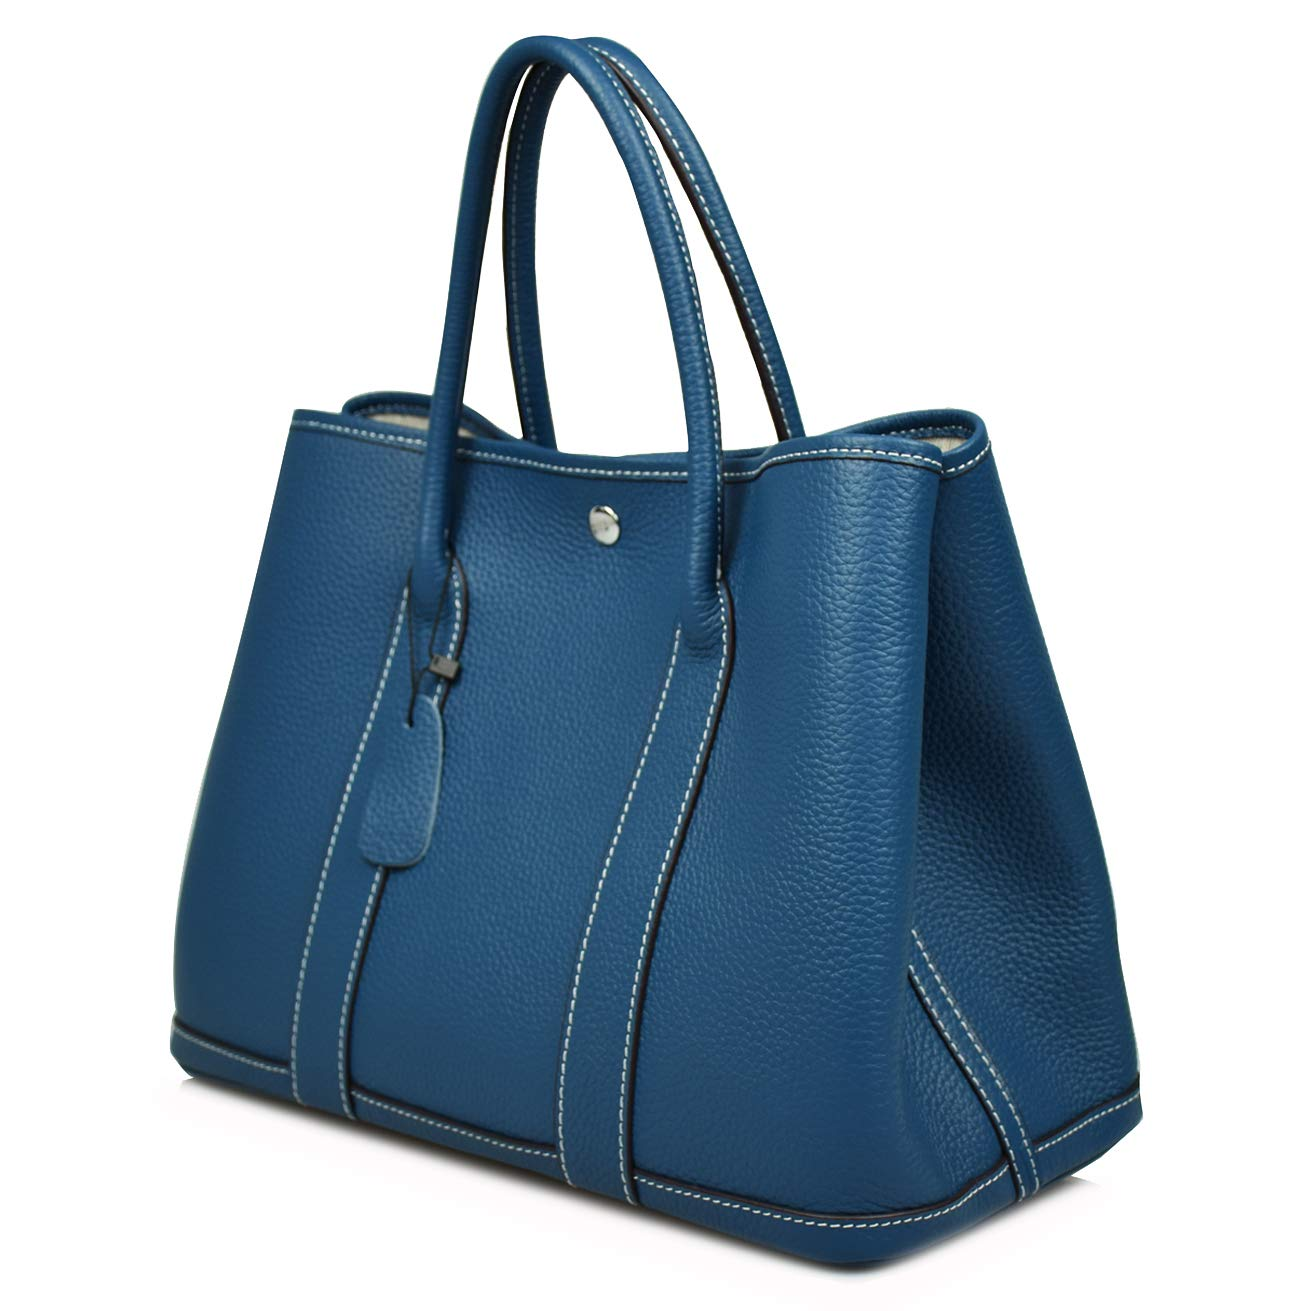 Esyuel Women's Genuine Leather Garden Tote Bag Top Handle Handbags(36CM) by ESYUEL